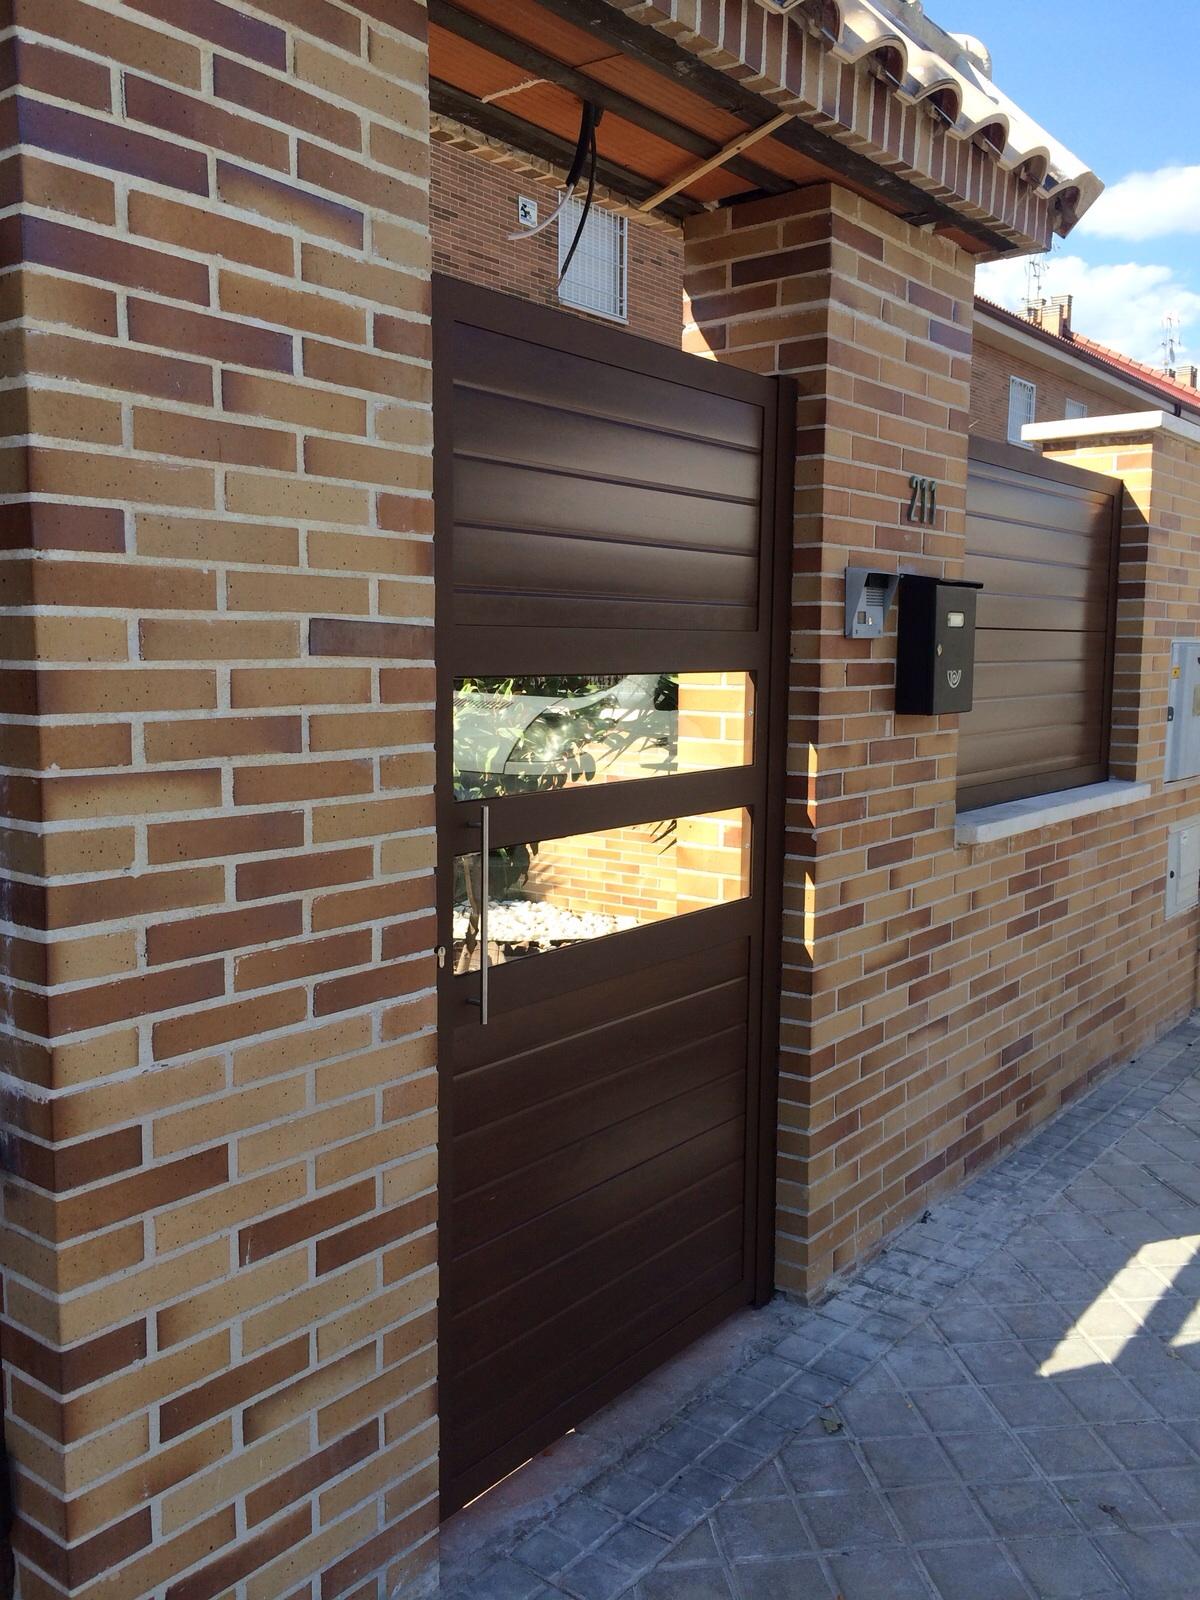 Puertas de aluminio exterior imitacion madera beautiful for Puertas imitacion madera exterior